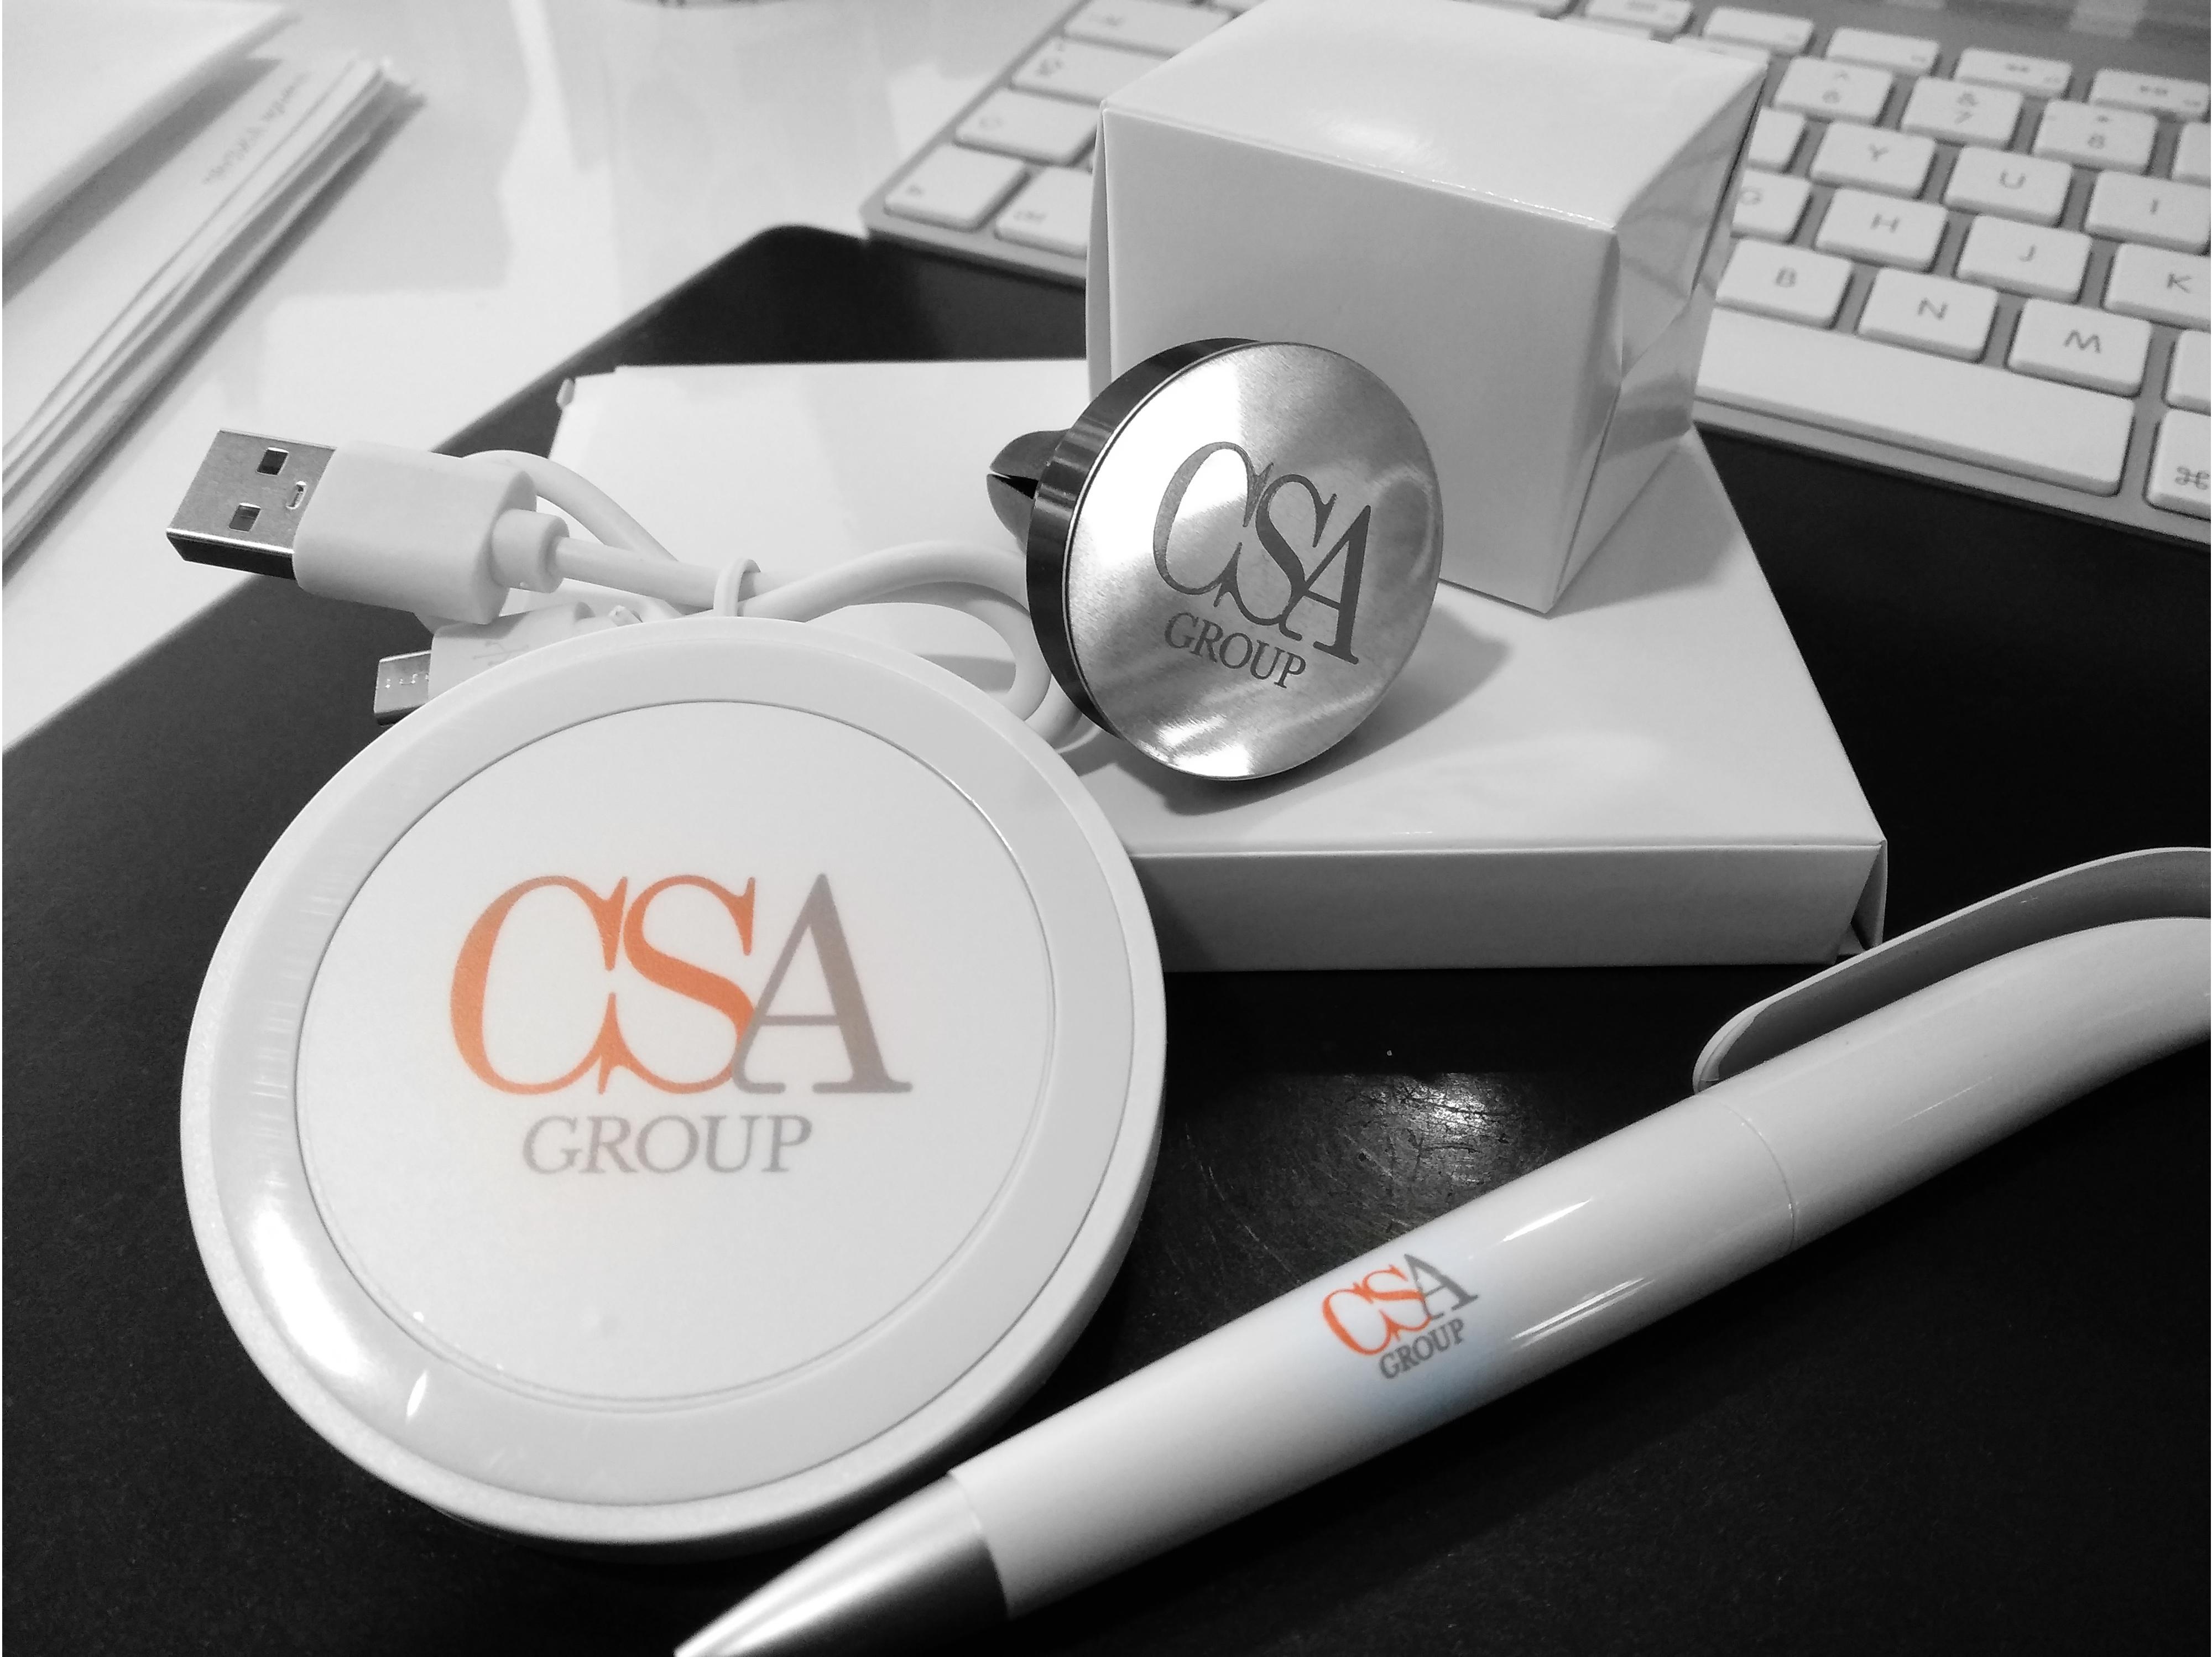 CSA Group branding material